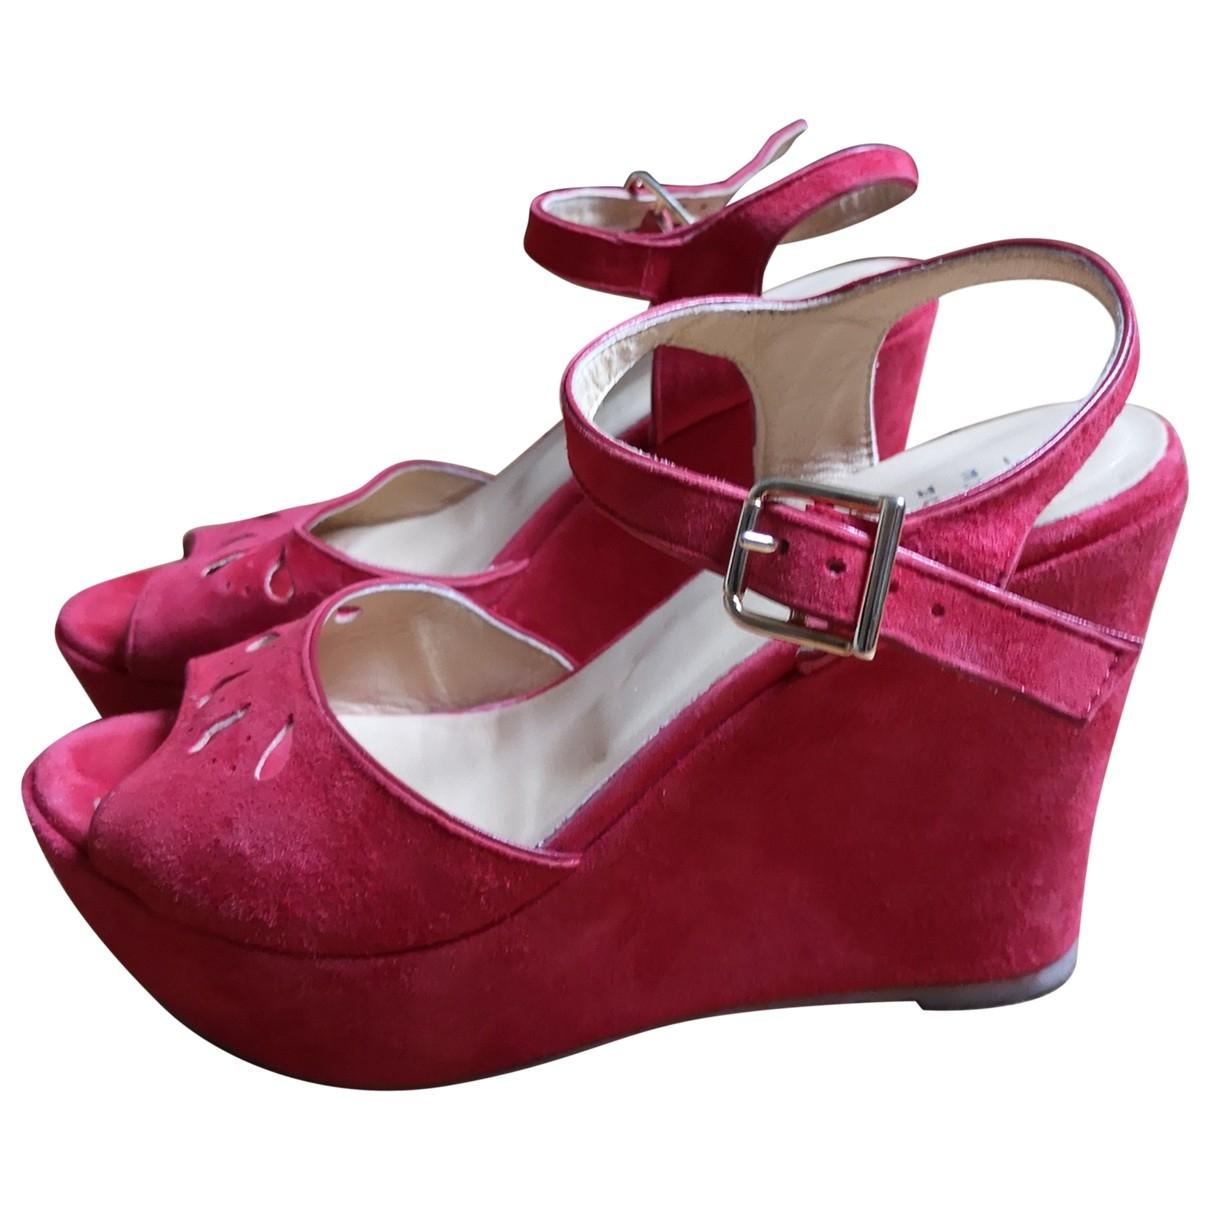 Claudie Pierlot \N Red Suede Sandals for Women 39 EU